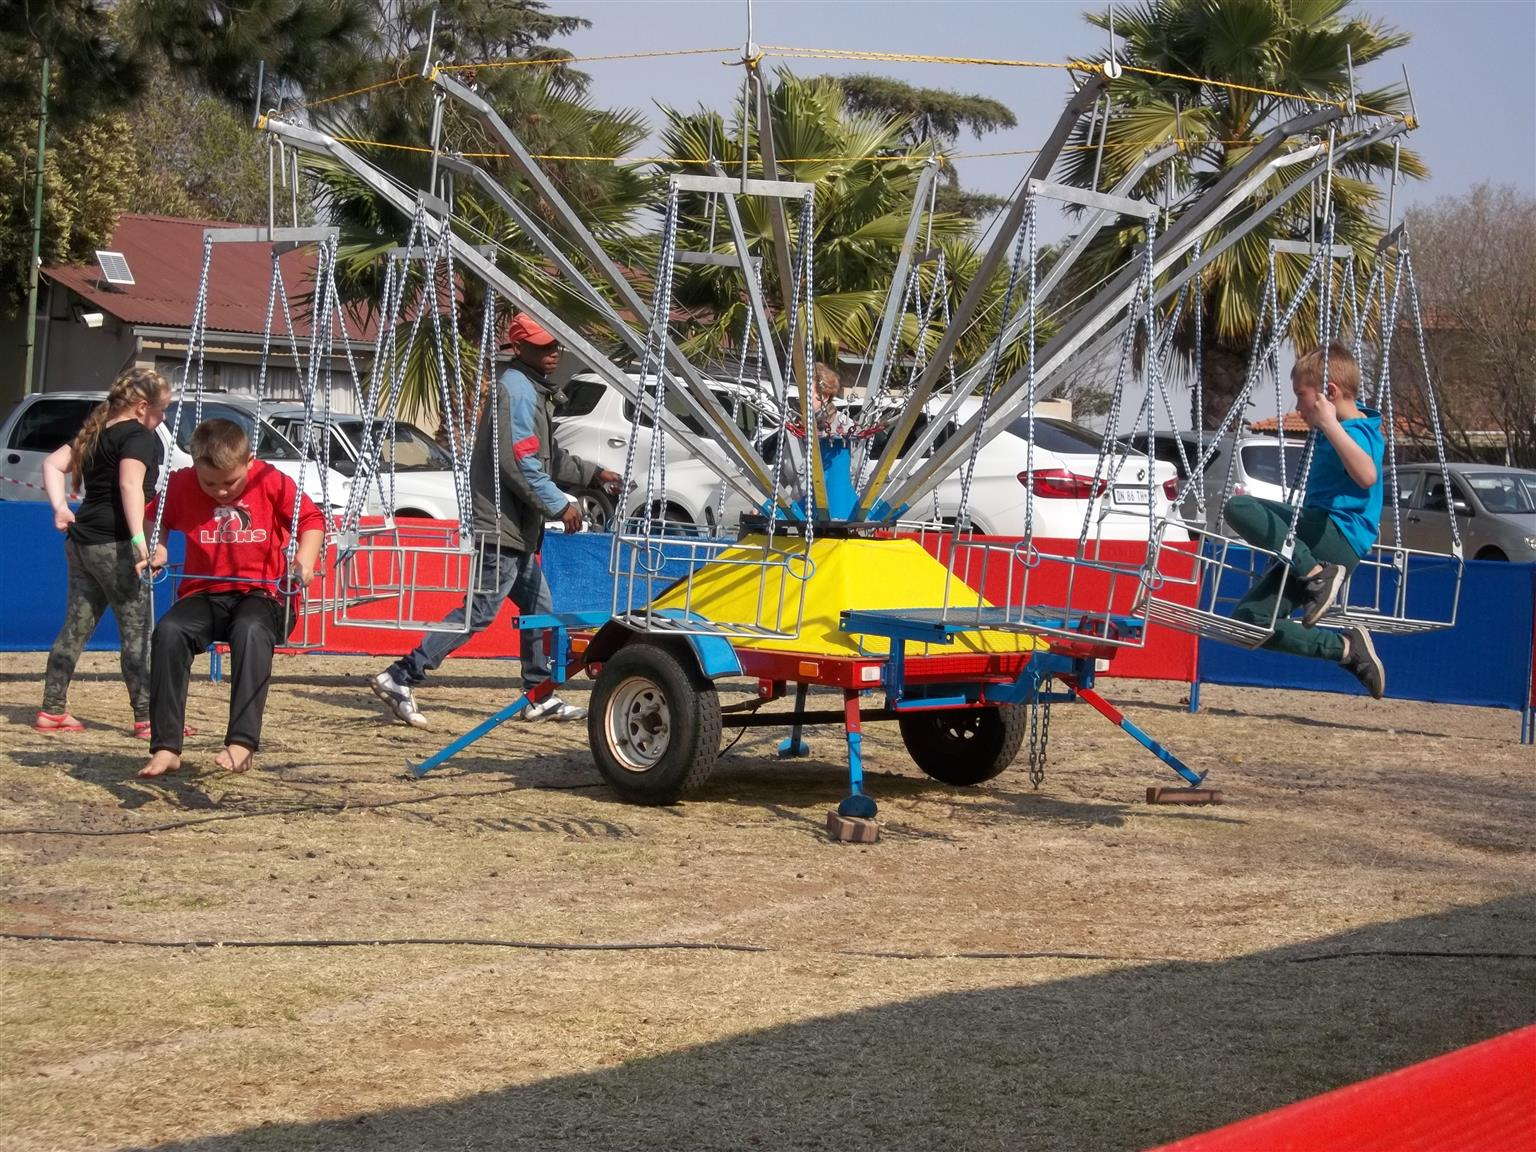 Carnival rides for sale - URGENT SALE